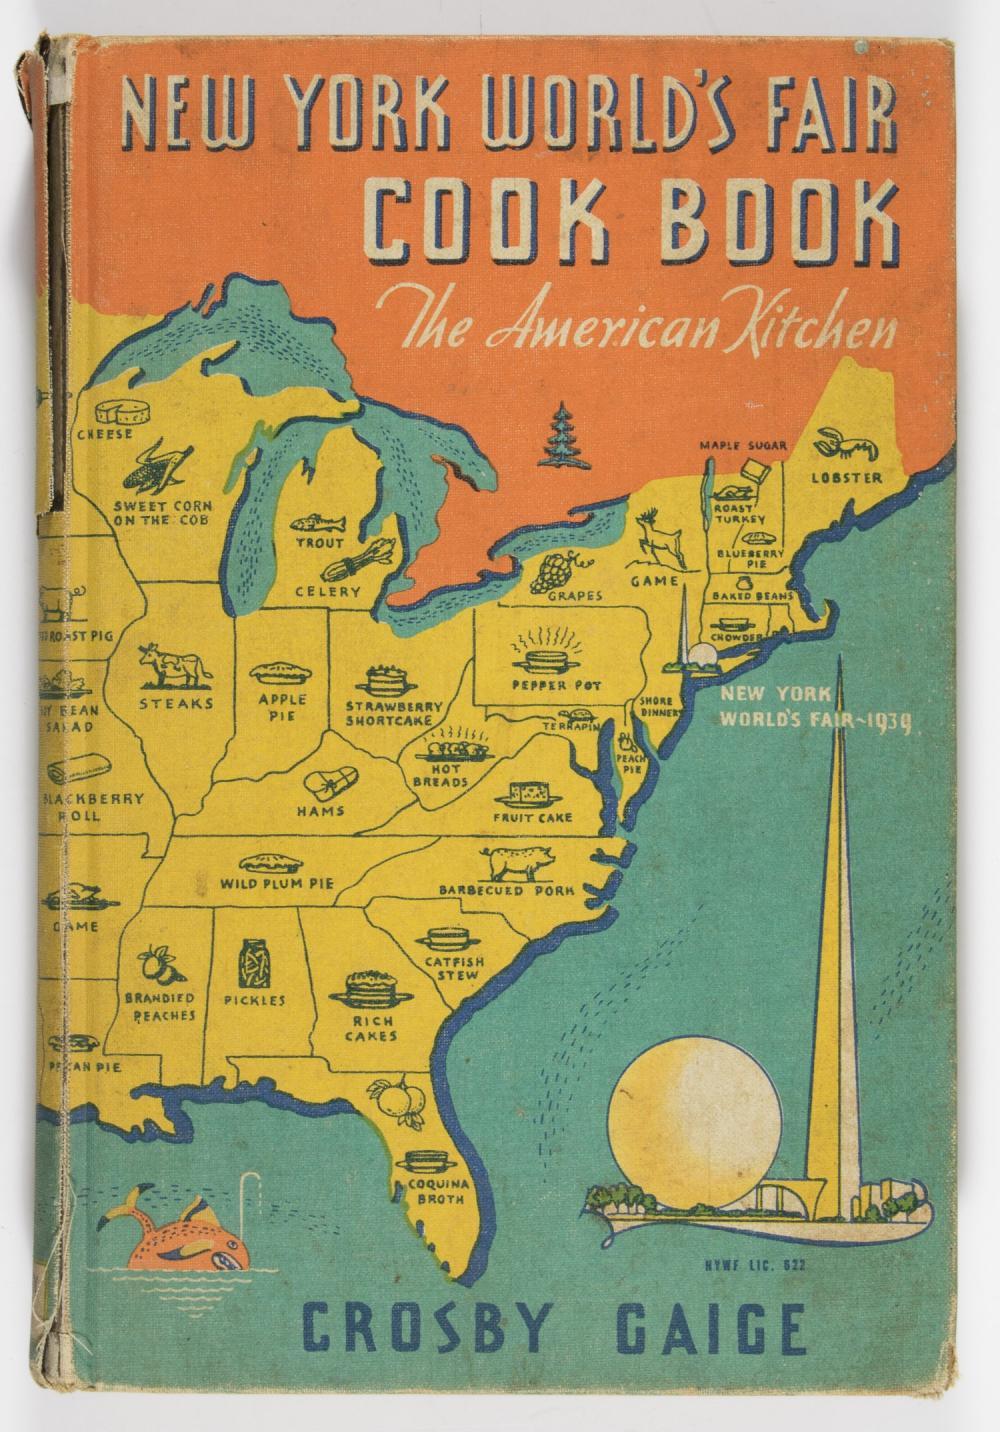 NEW YORK'S WORLD FAIR COOKBOOK